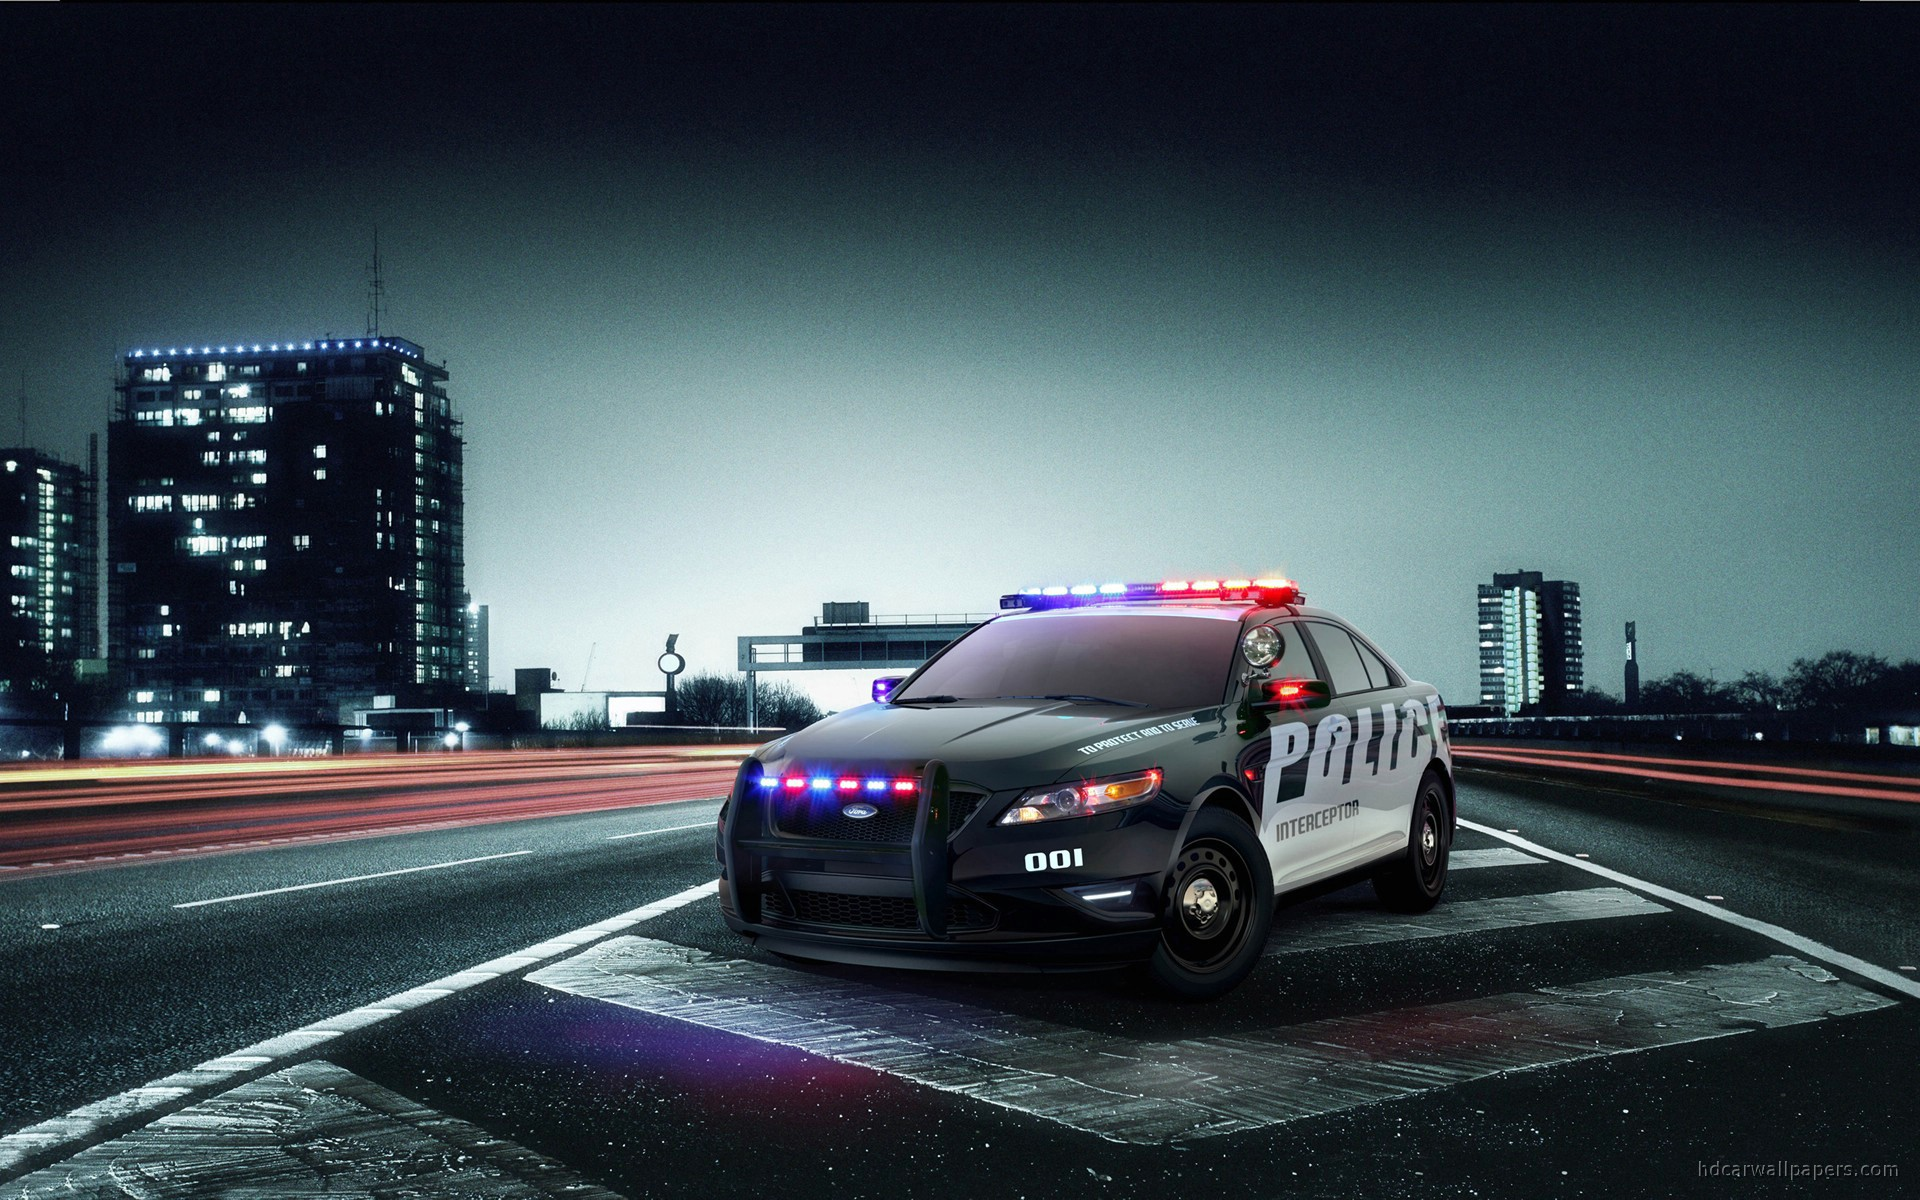 Ford Police Interceptor Wallpaper | HD Car Wallpapers | ID #685